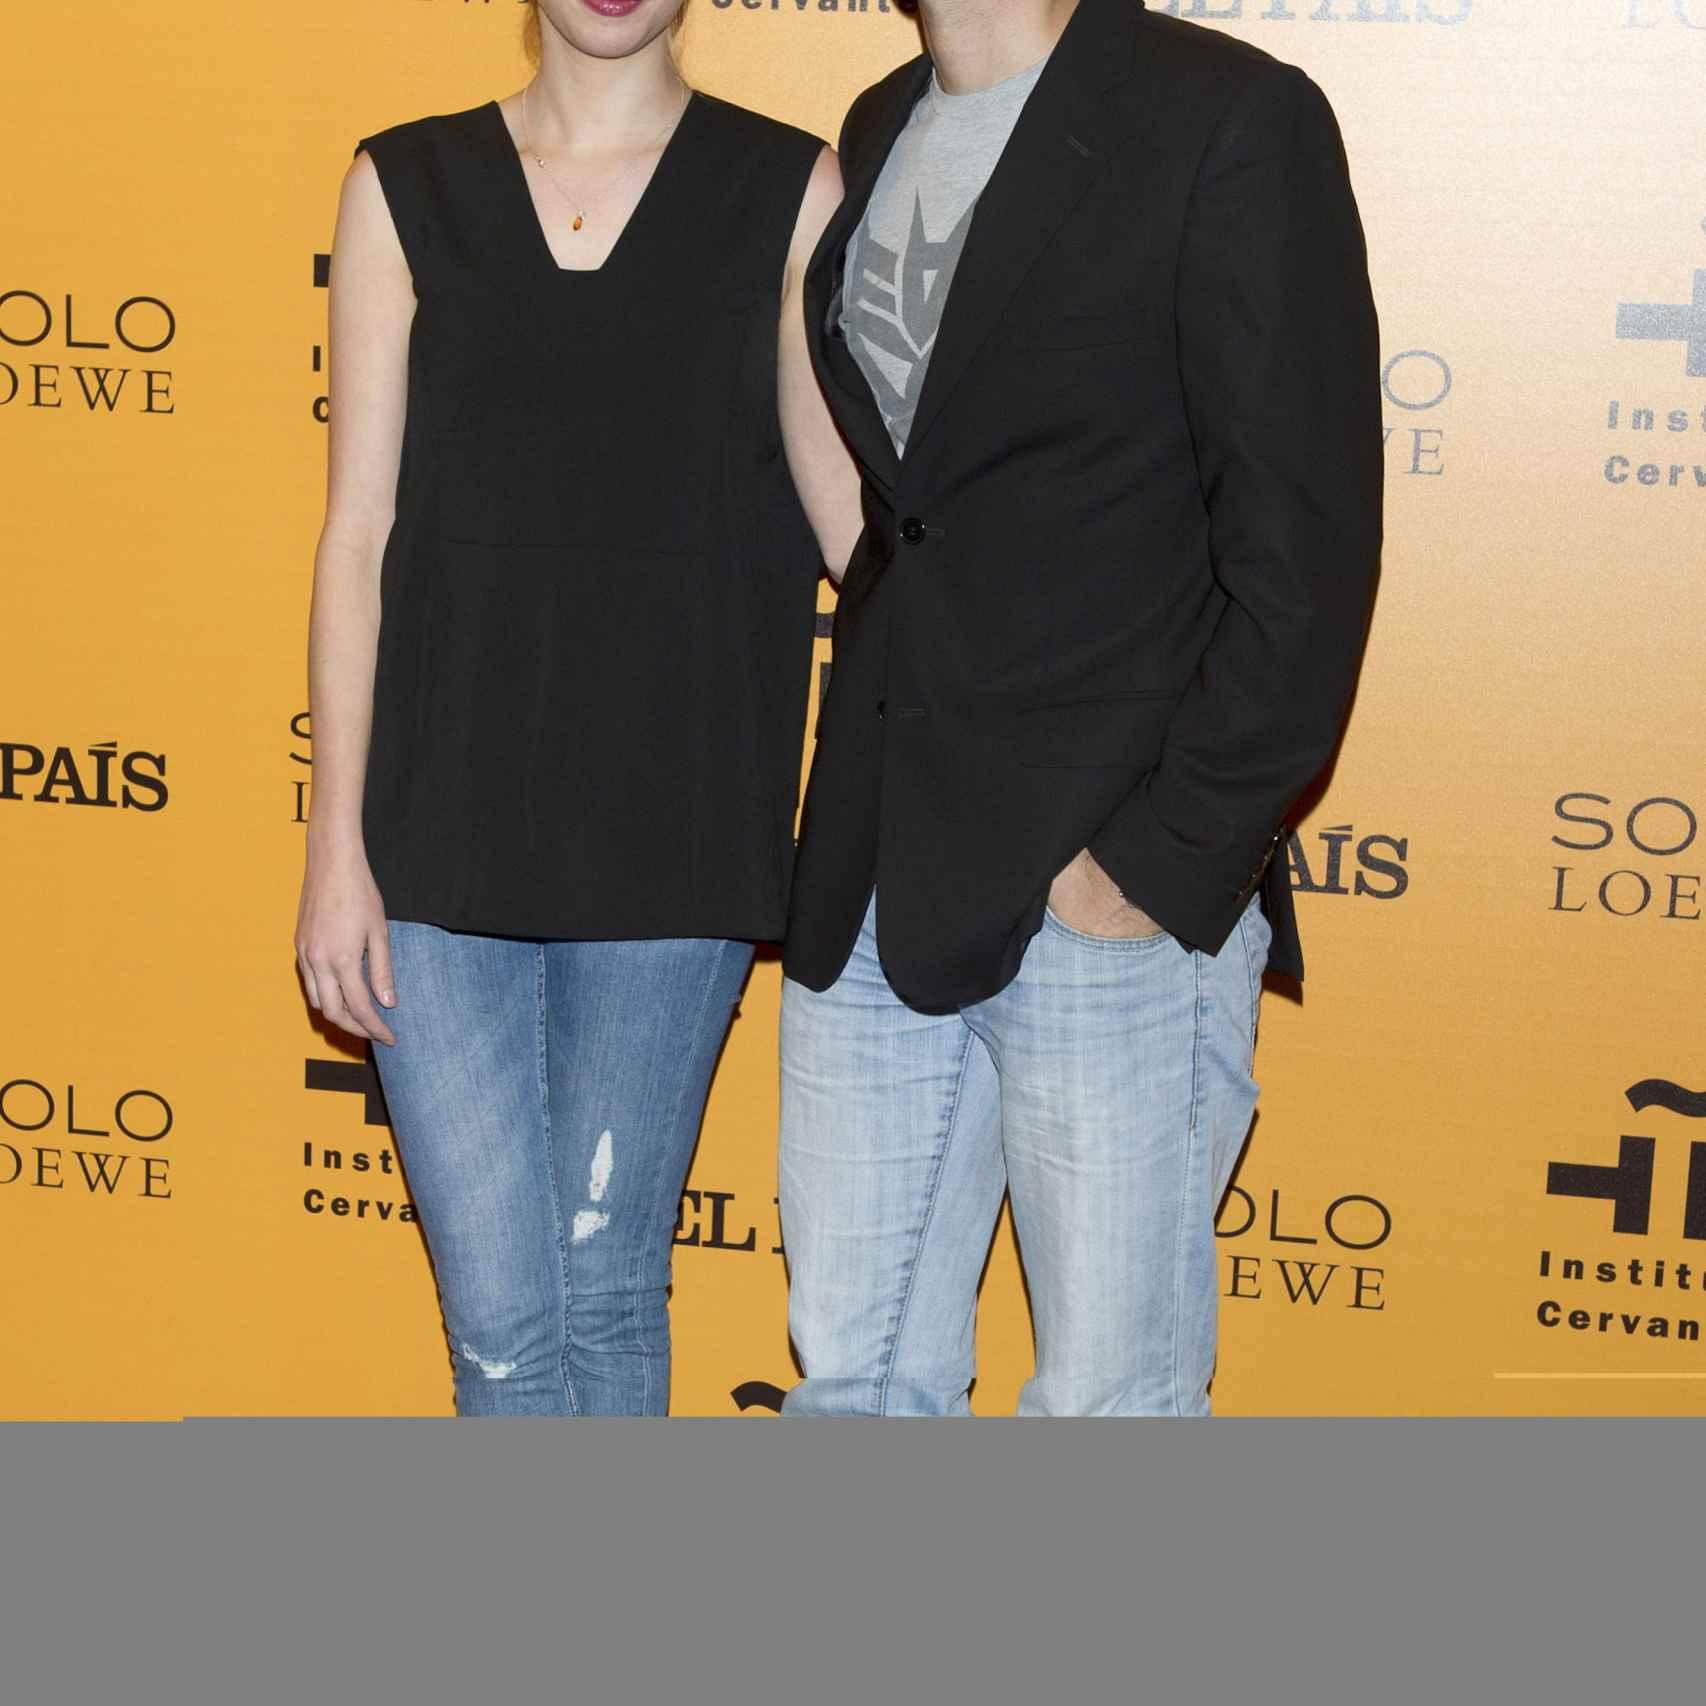 Lulu Figueroa y su novio Adrián Saavedra